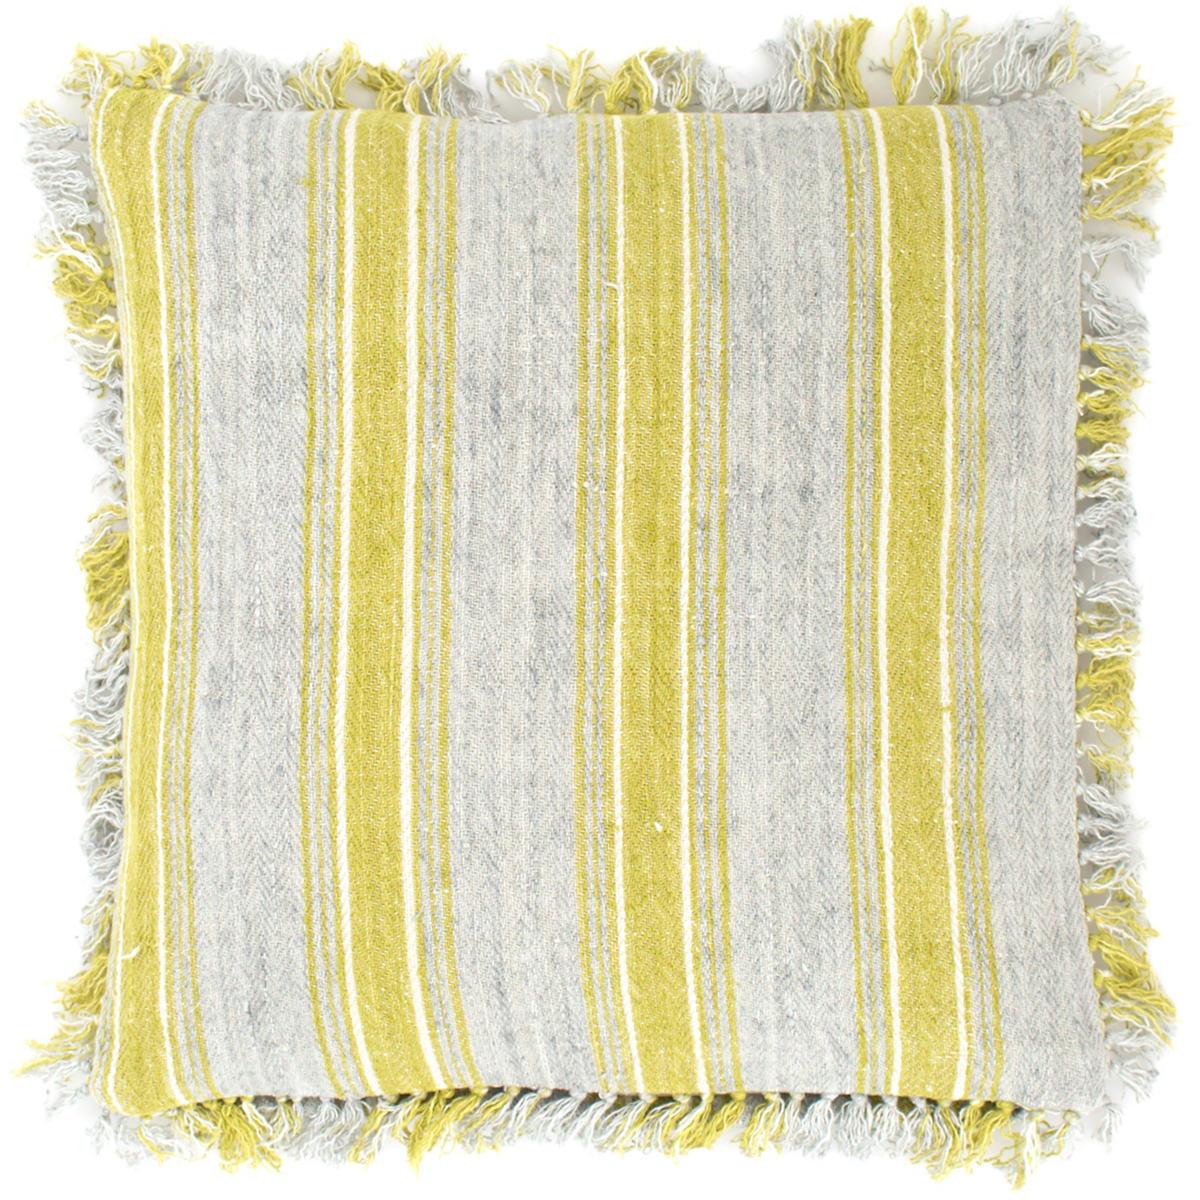 Laundered Linen Ticking Blue Decorative Pillow